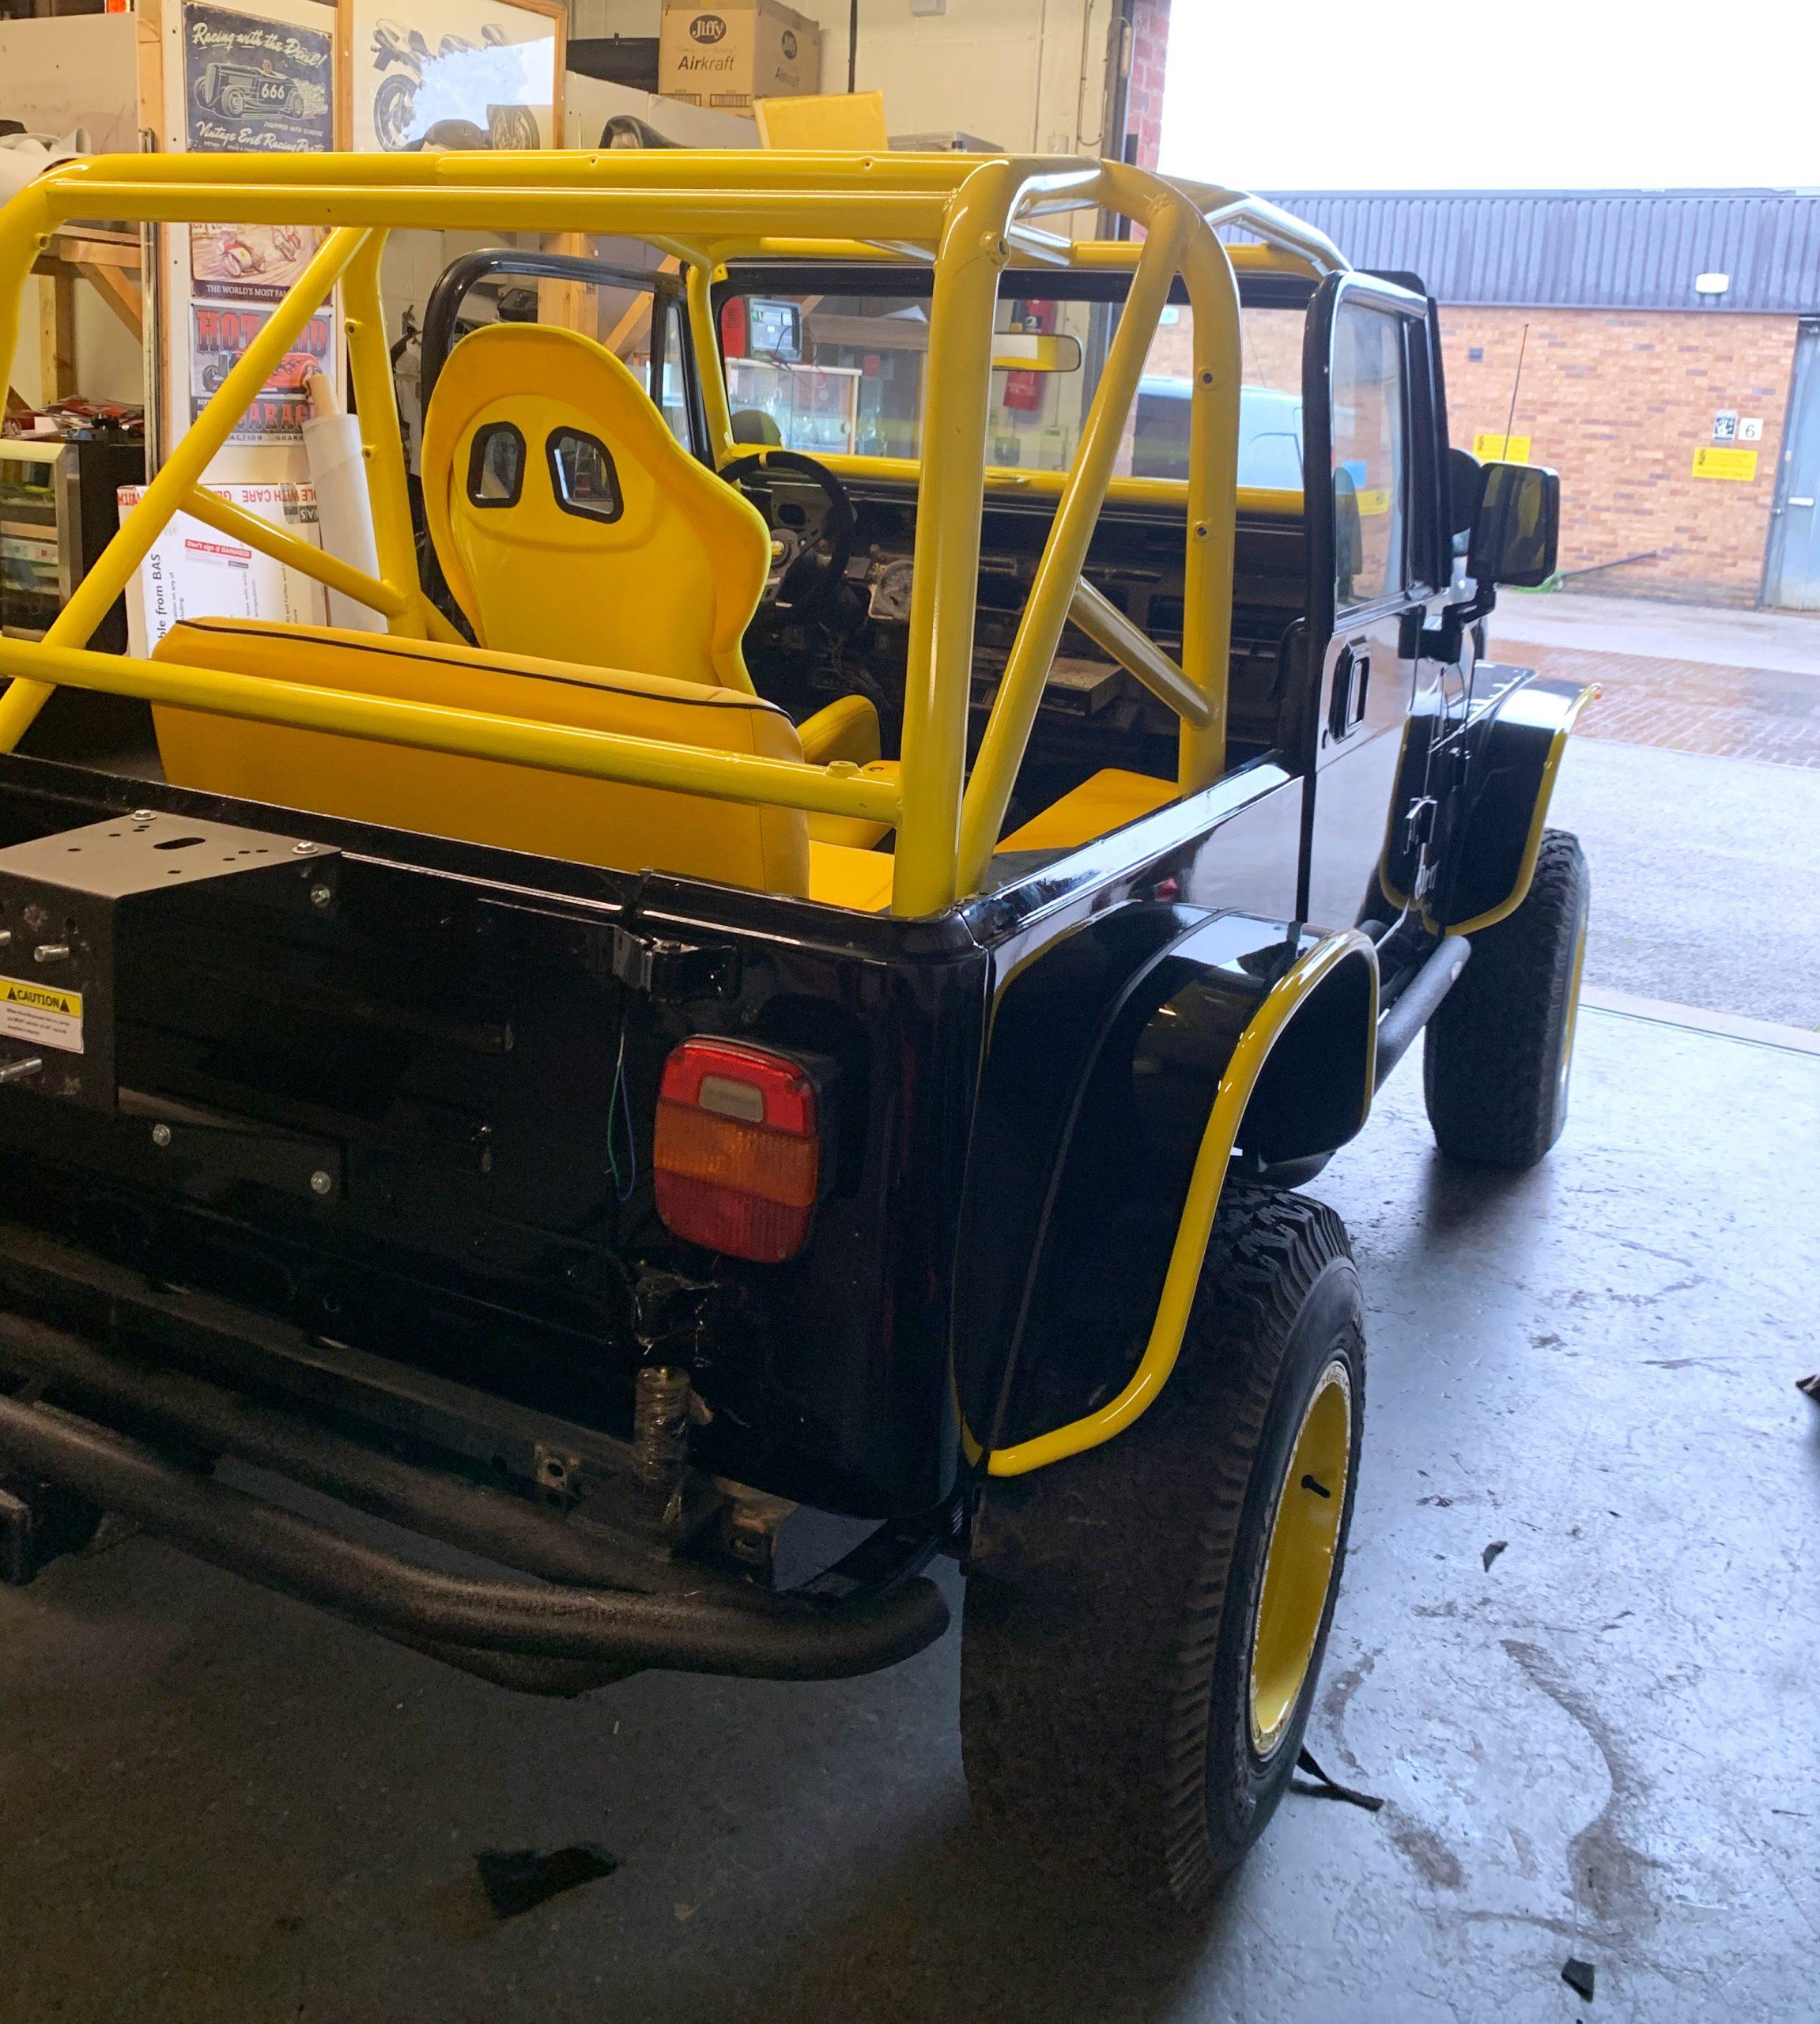 Jeep+Interior+to+match+black+and+yellow+bodywork